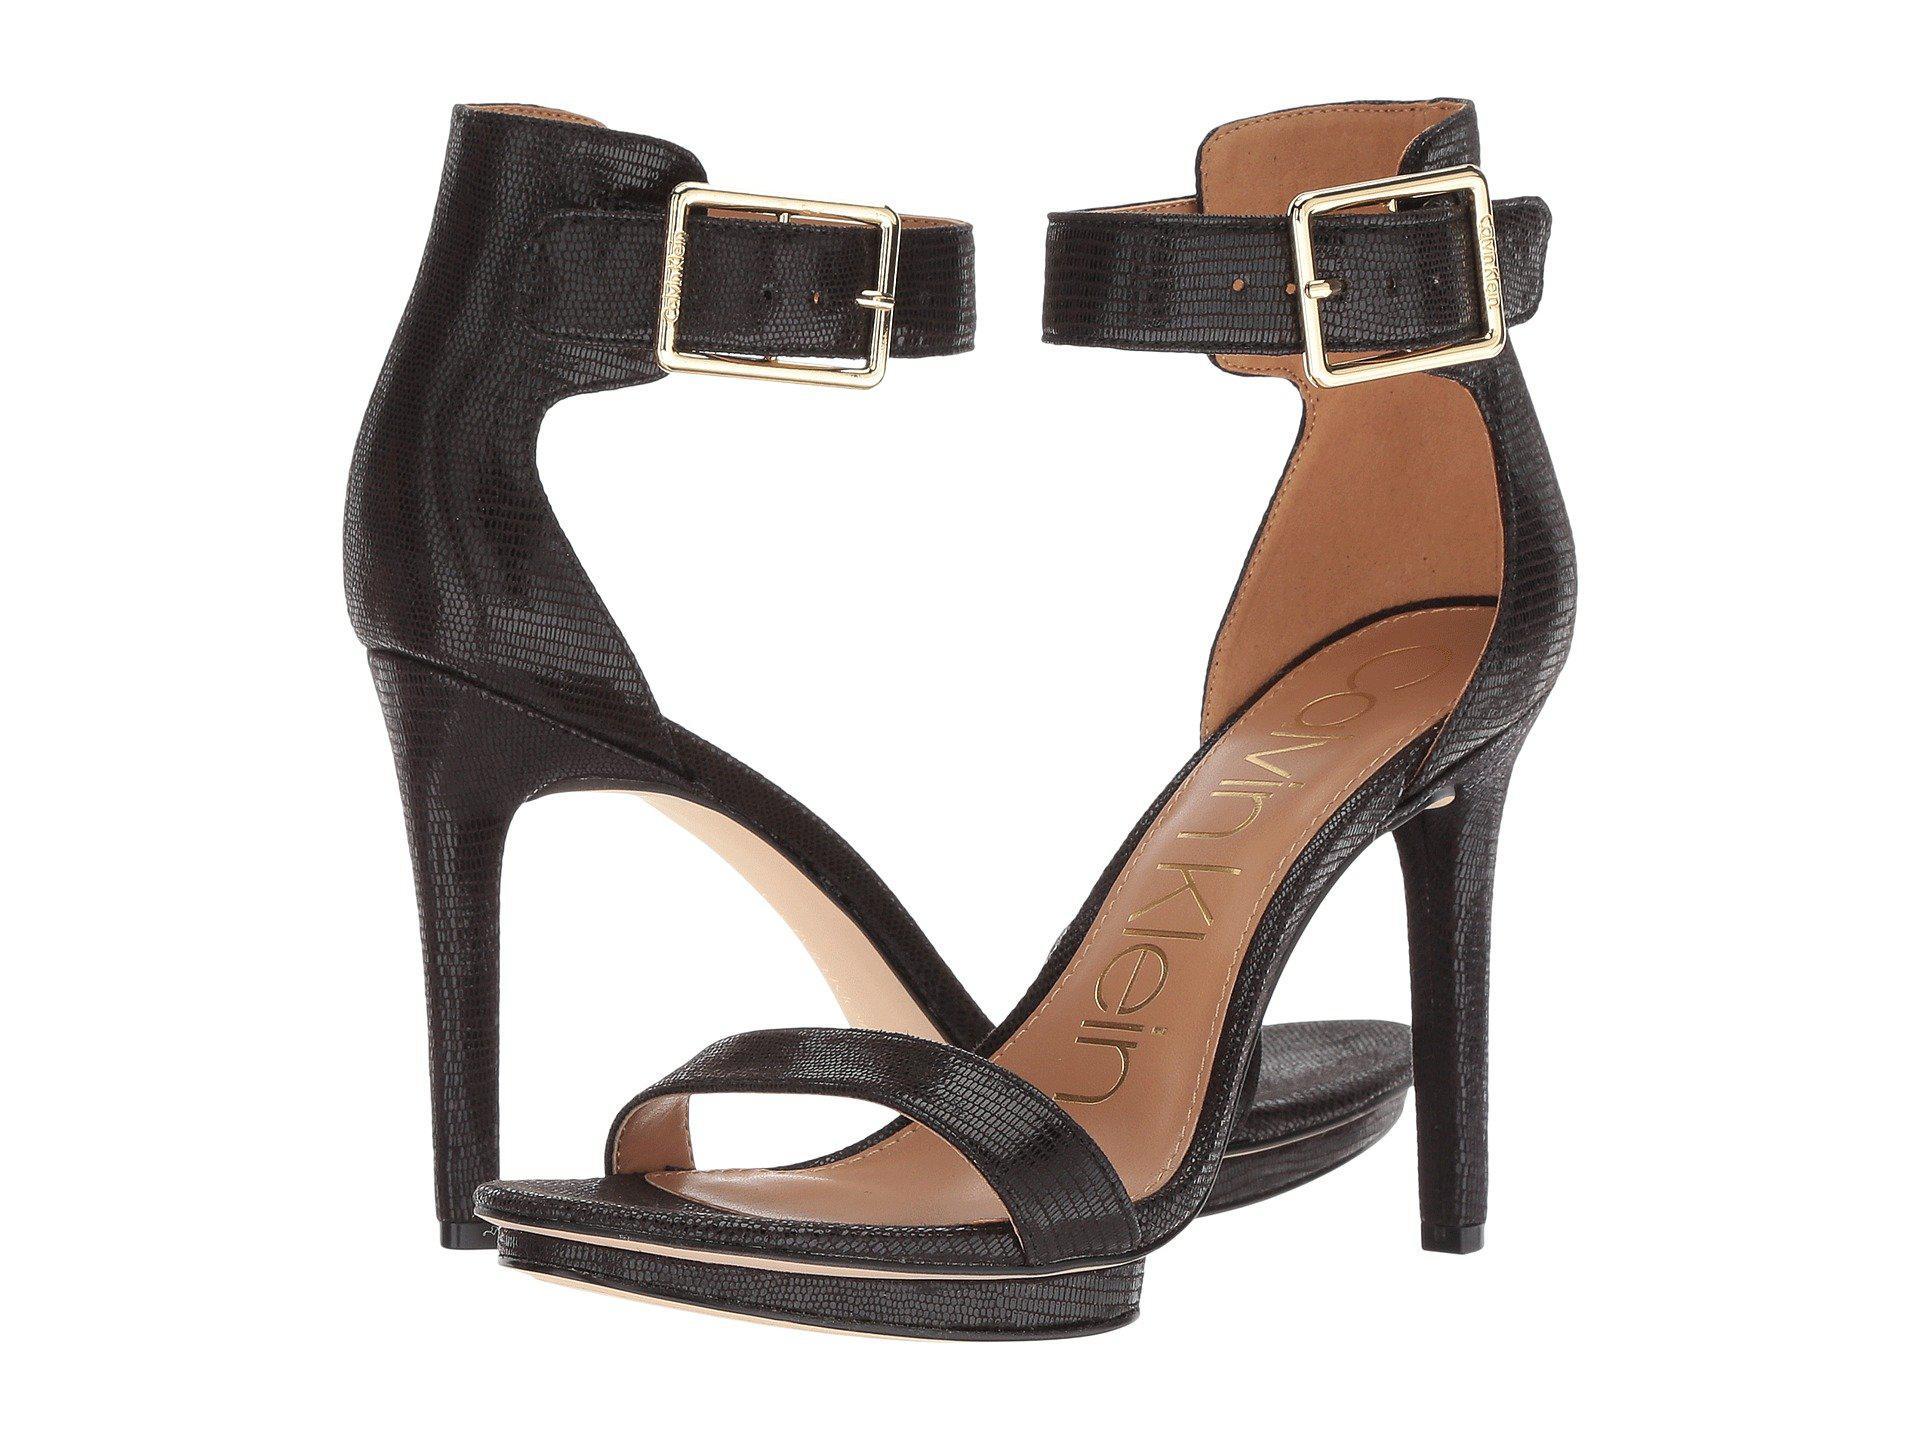 7da0a4f15d86 Lyst - Calvin Klein Vivian Platform Sandal in Black